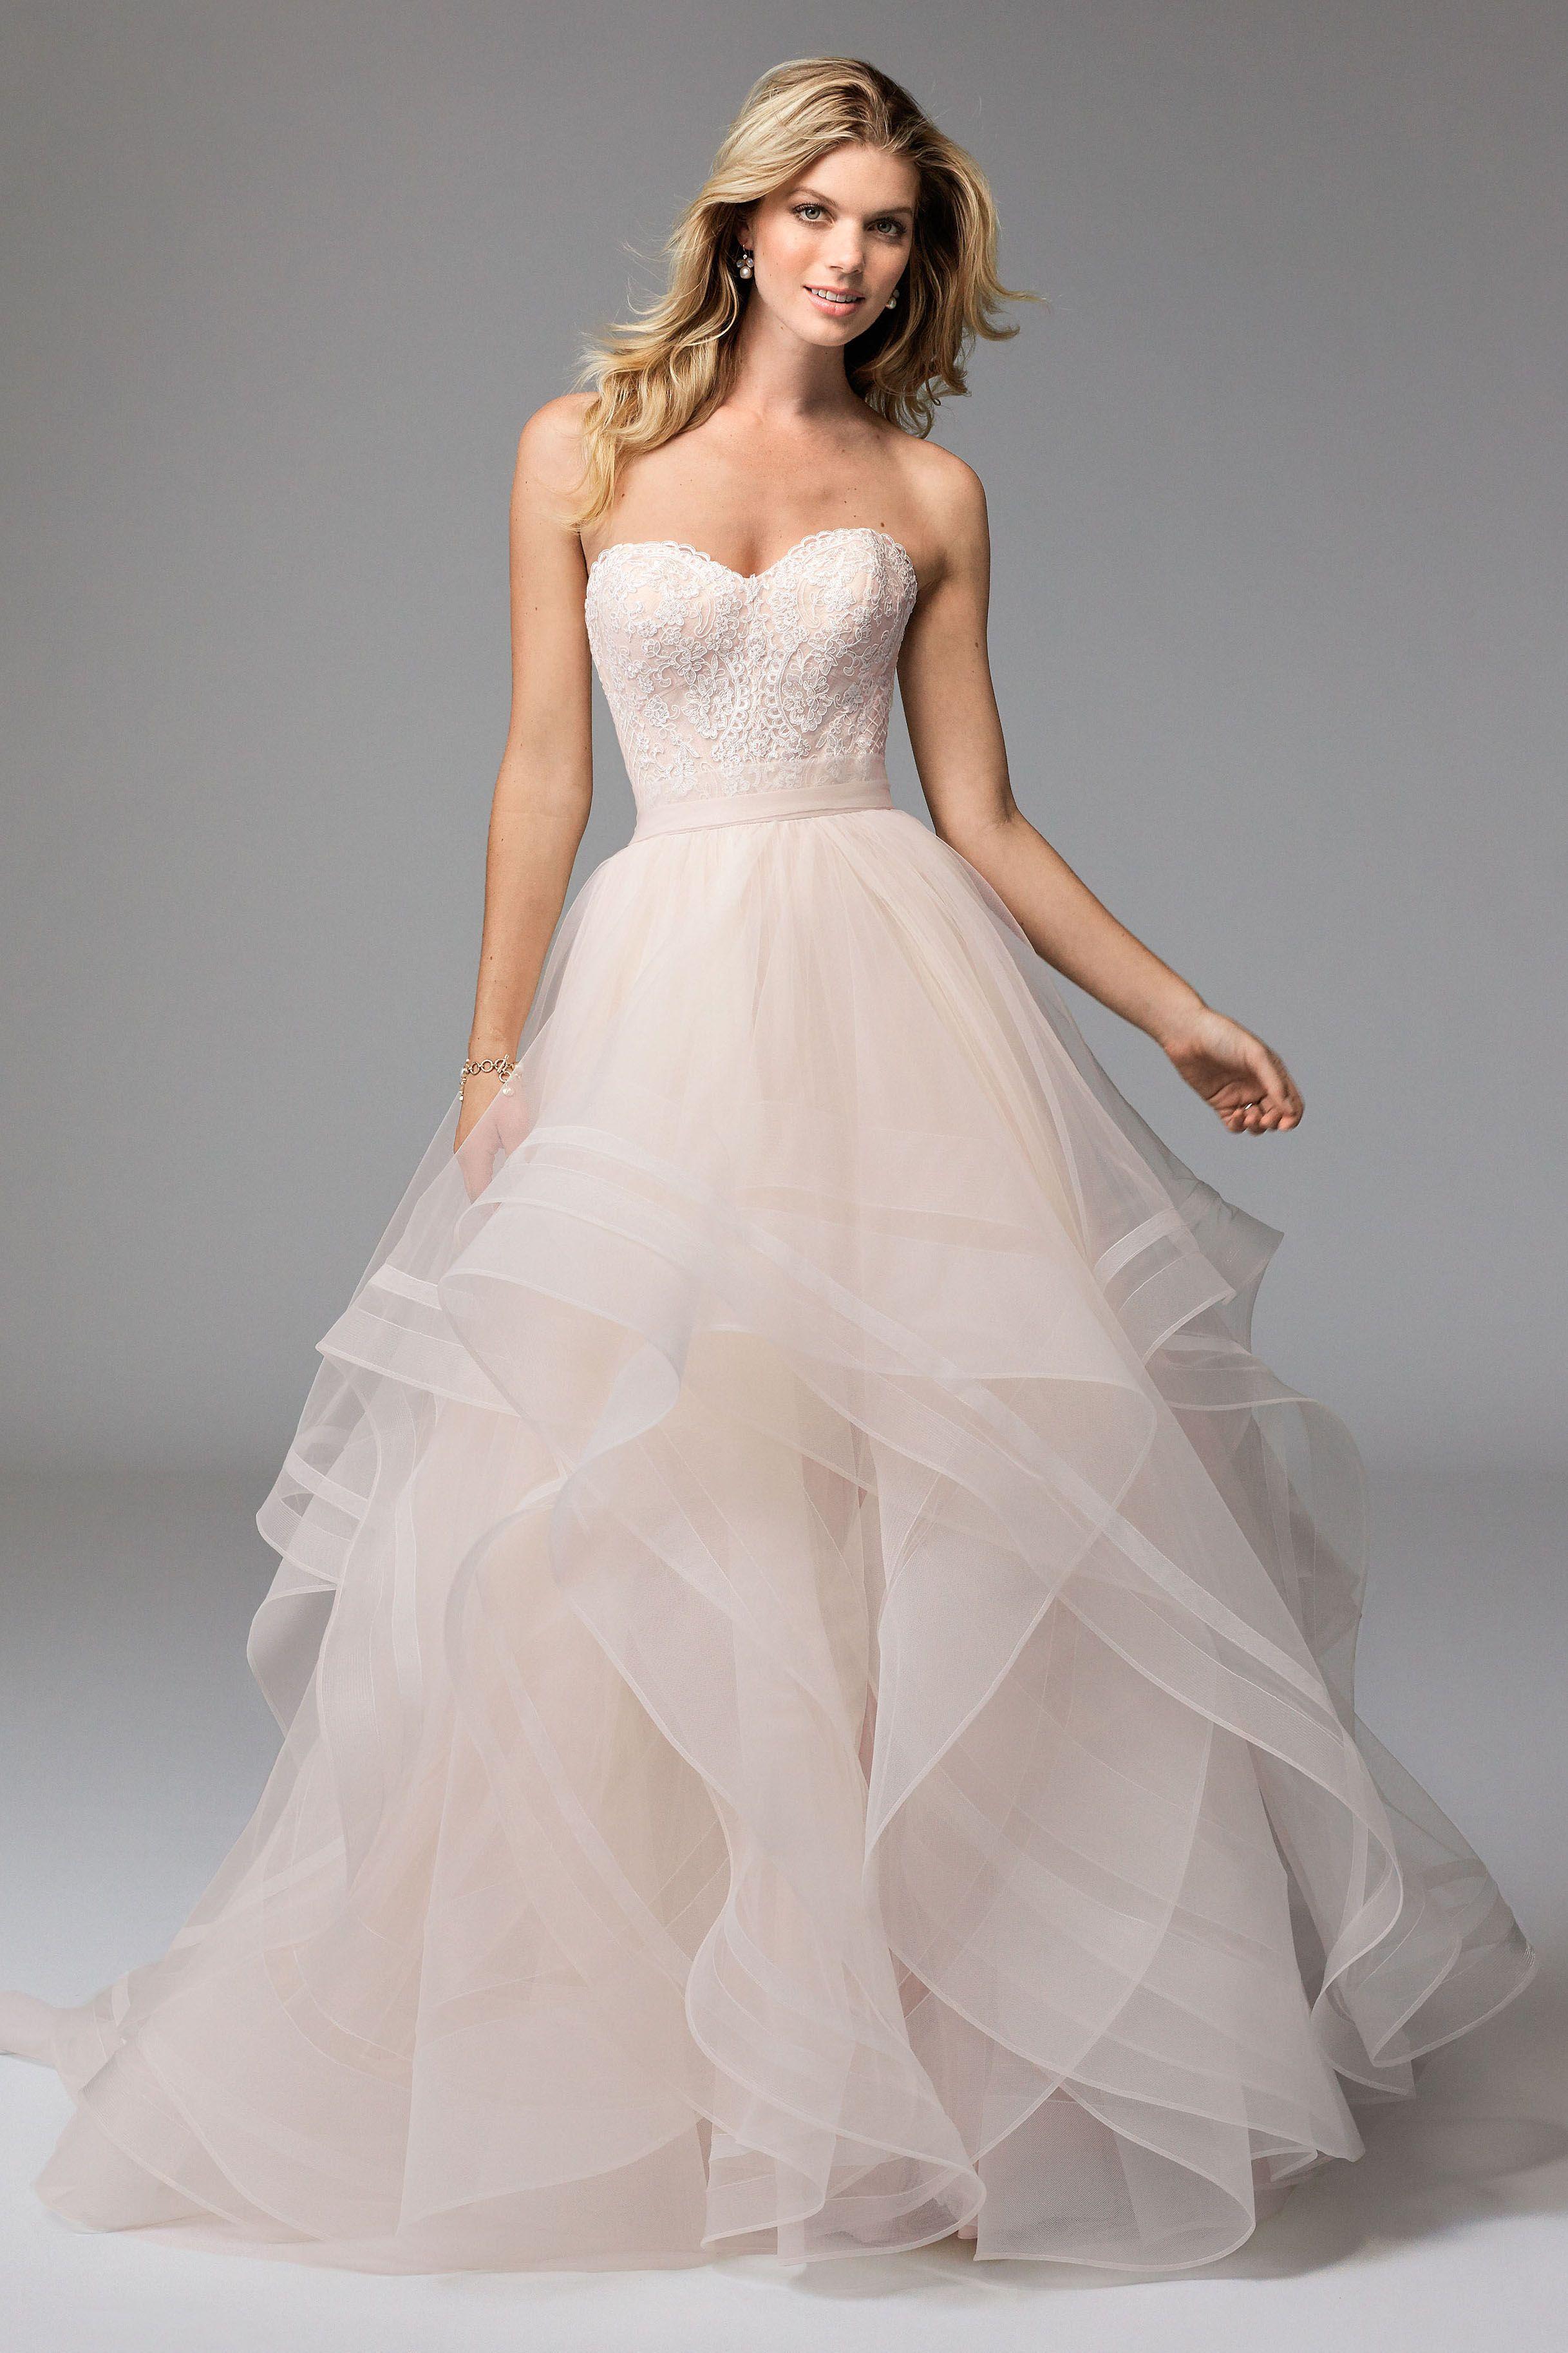 corset style wedding dresses watterswtoo Wtoo Style Lula Corset Effie Skirt Blush Bridal Separates